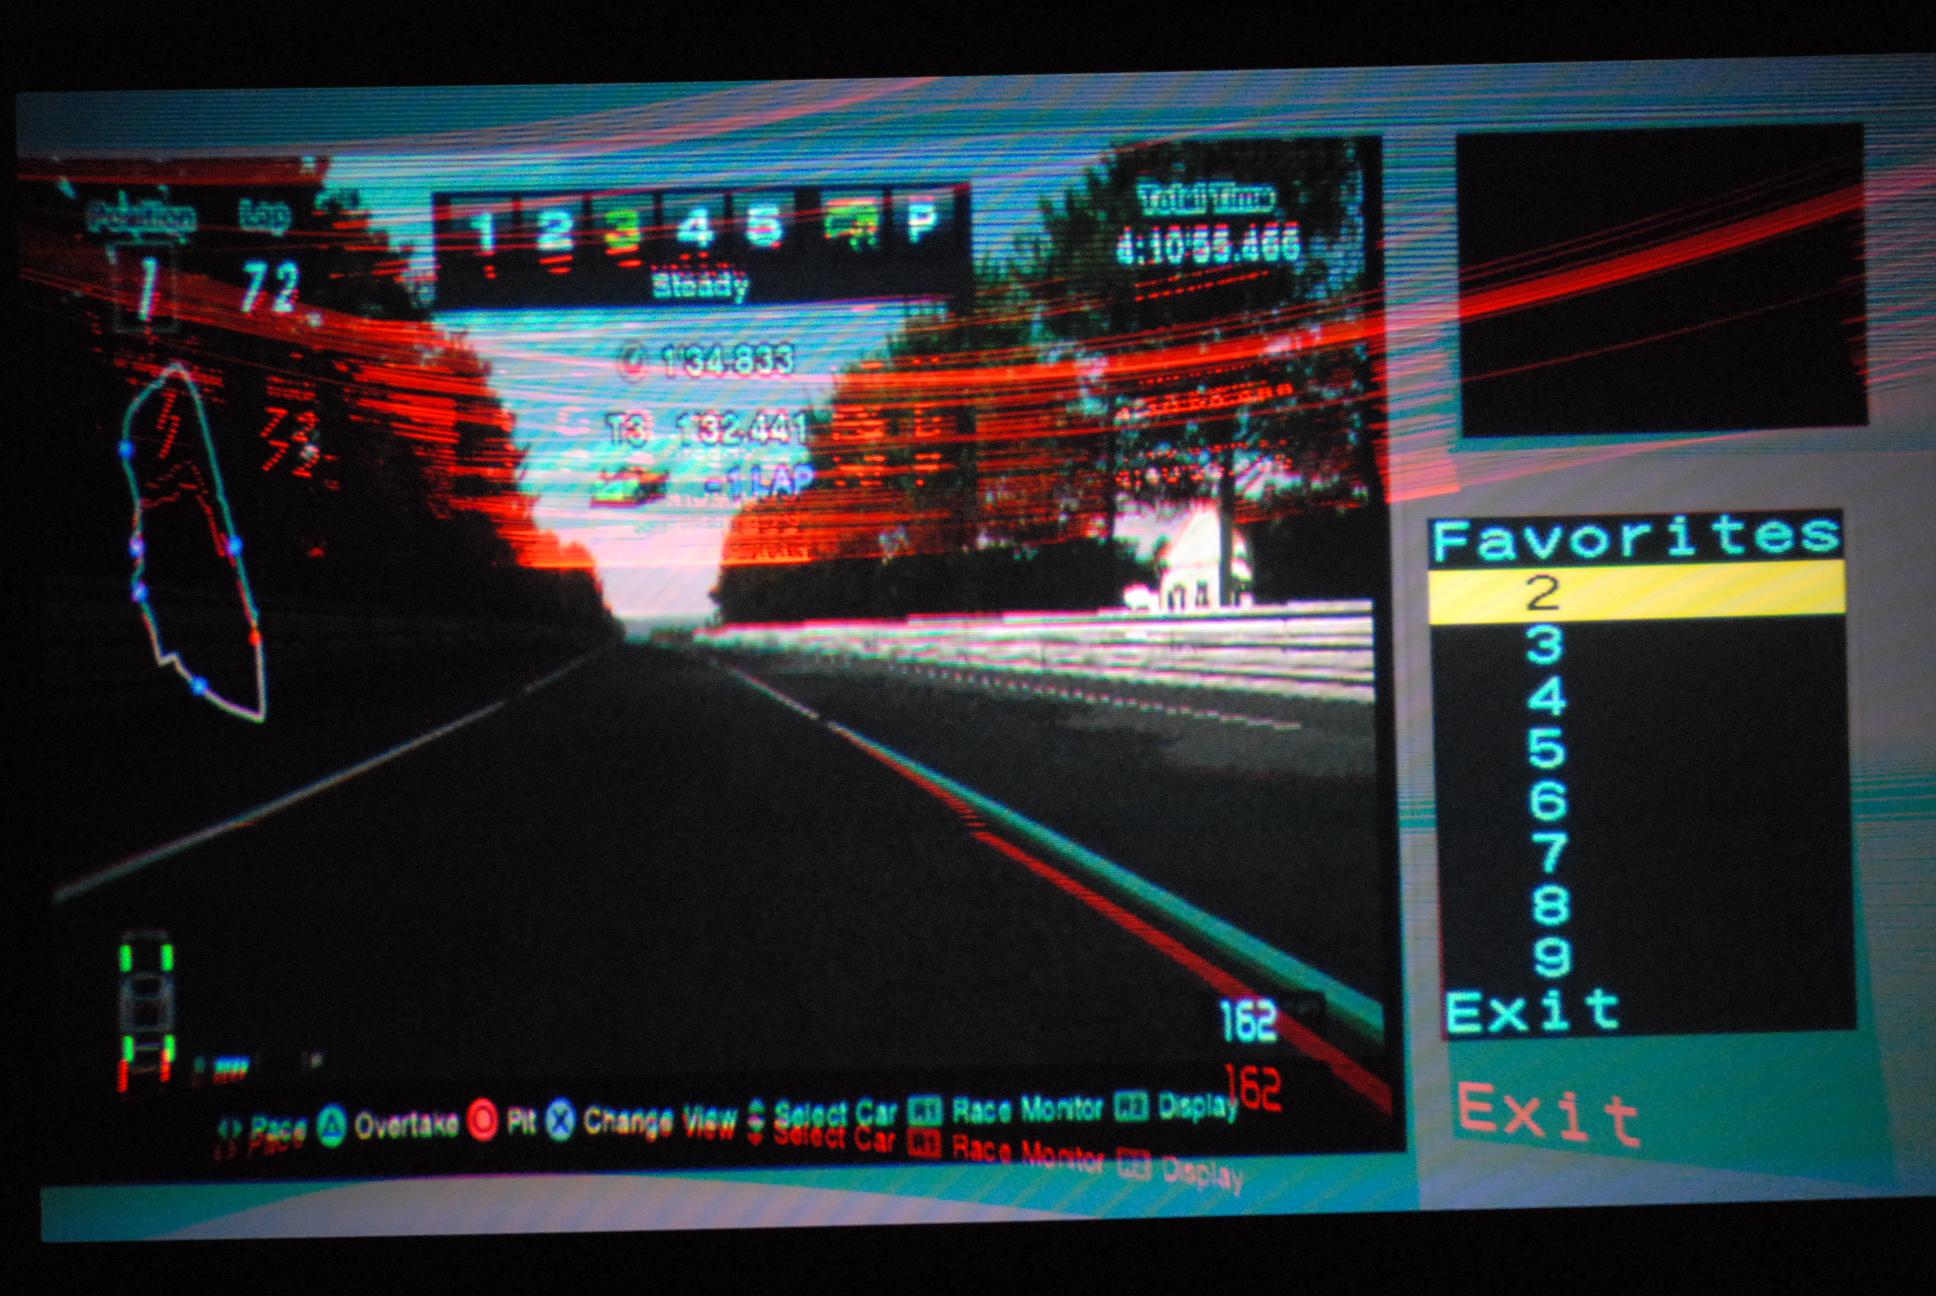 sony 65 inch rear projection hdtv suddenly displays red bands rh forum videohelp com Sony Wega LCD Projection TV Sony Wega Projection TV